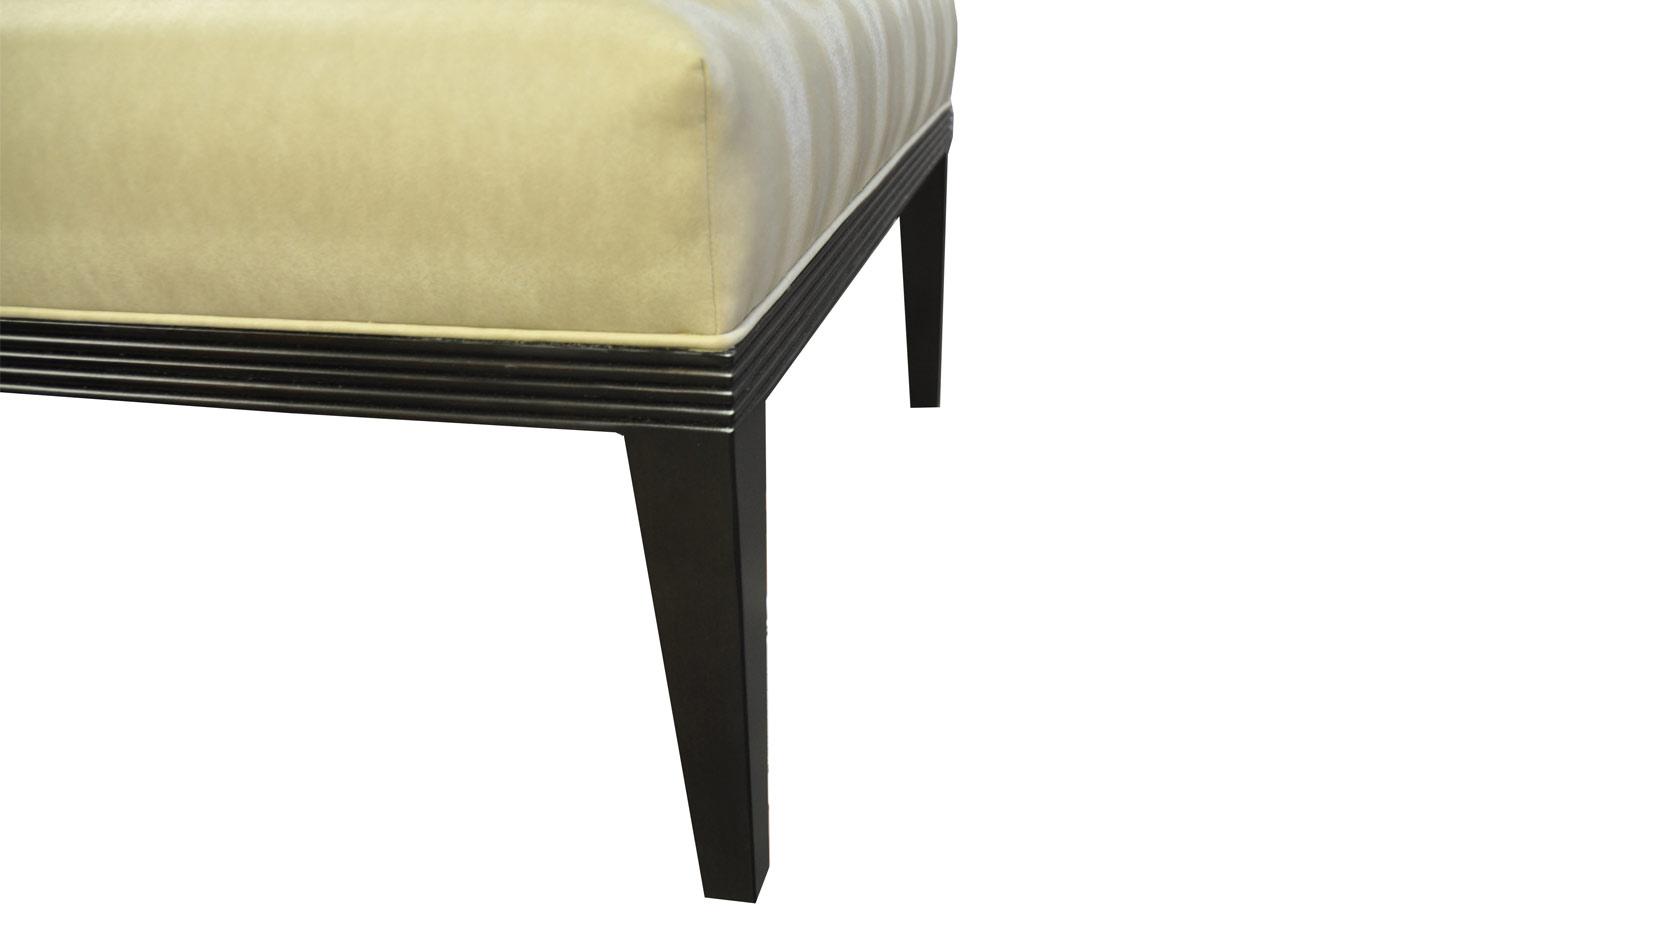 Carlisle All-Upholstered Ottoman